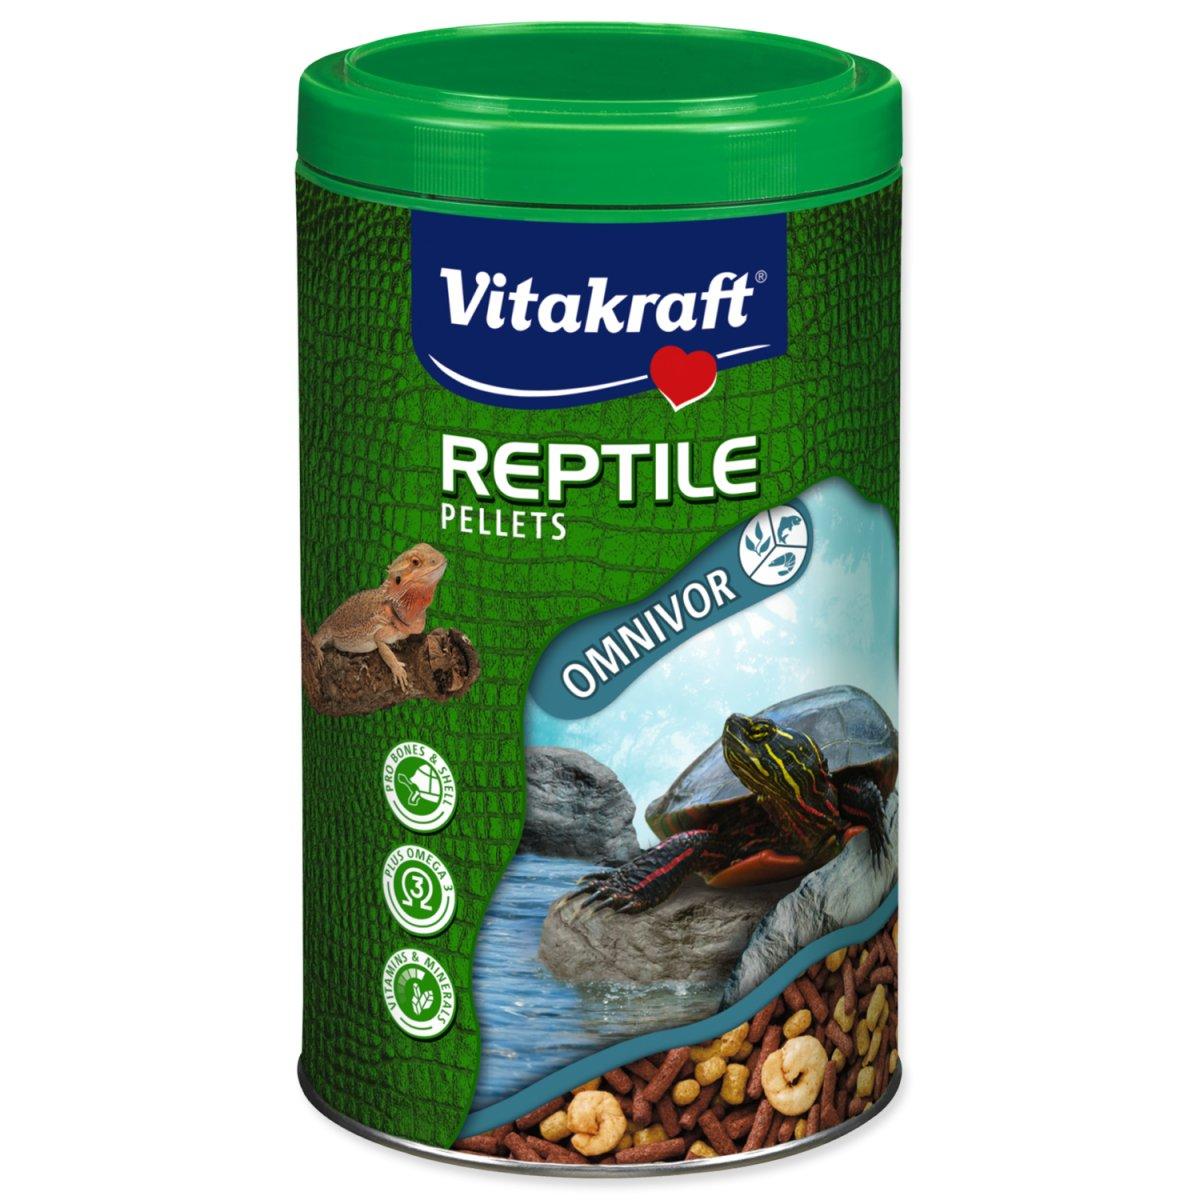 VITAKRAFT Reptile Pellets (1l)